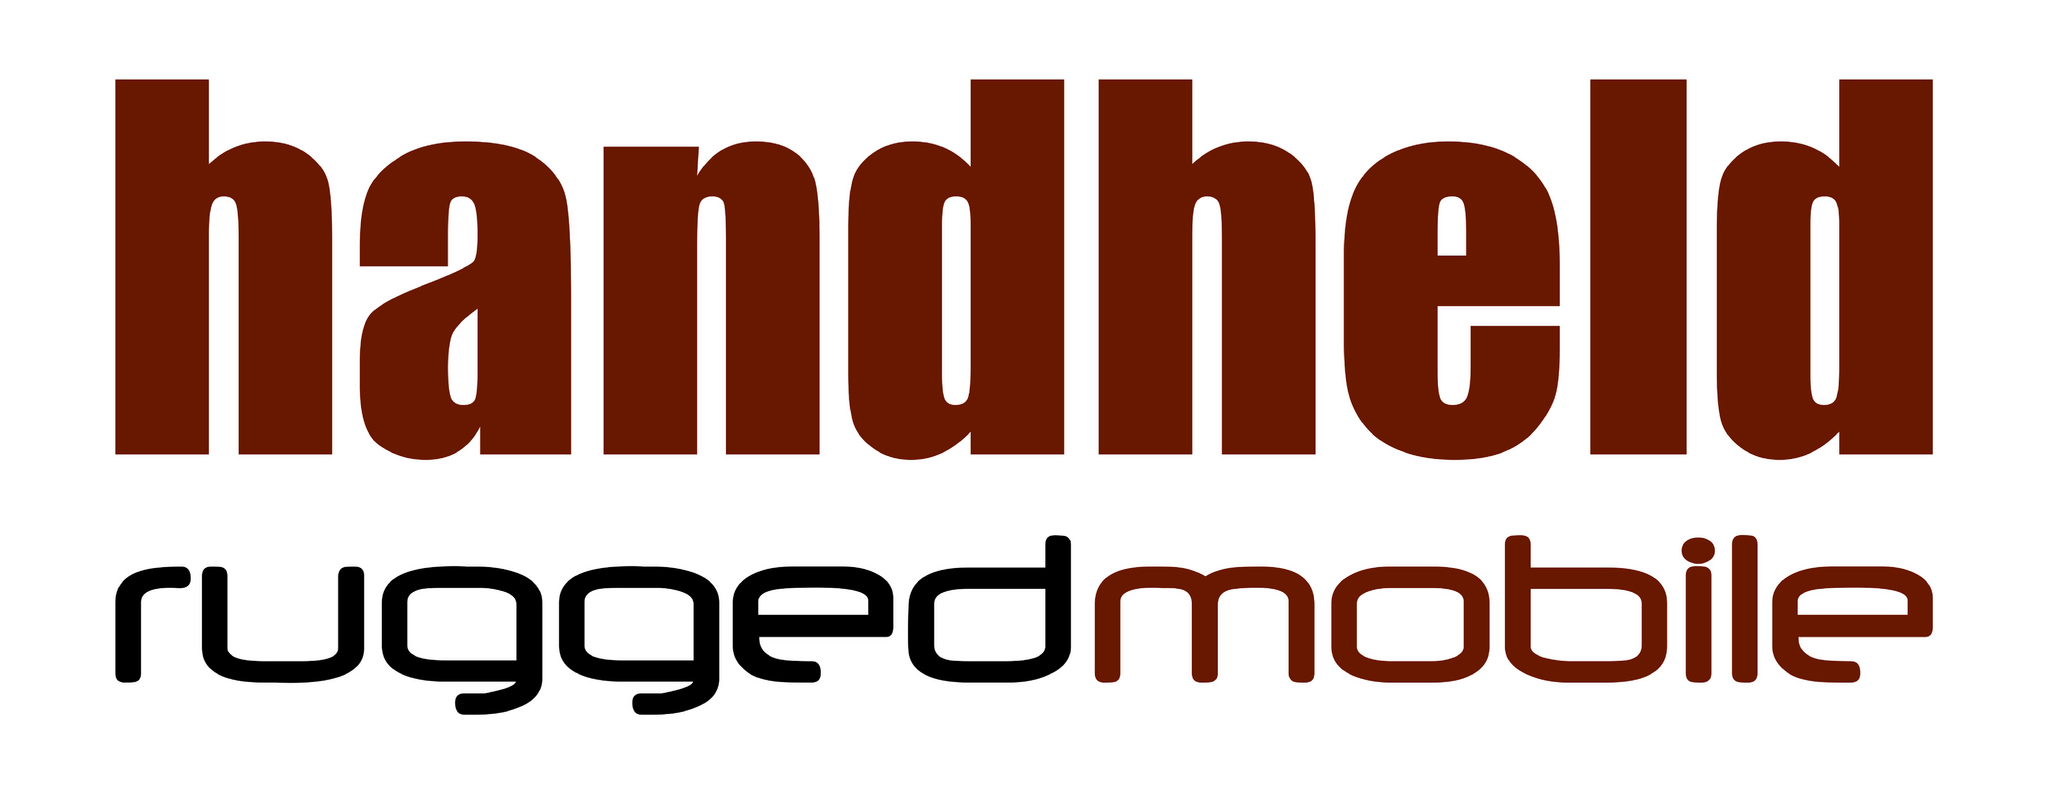 Handheld - Rugged Mobile